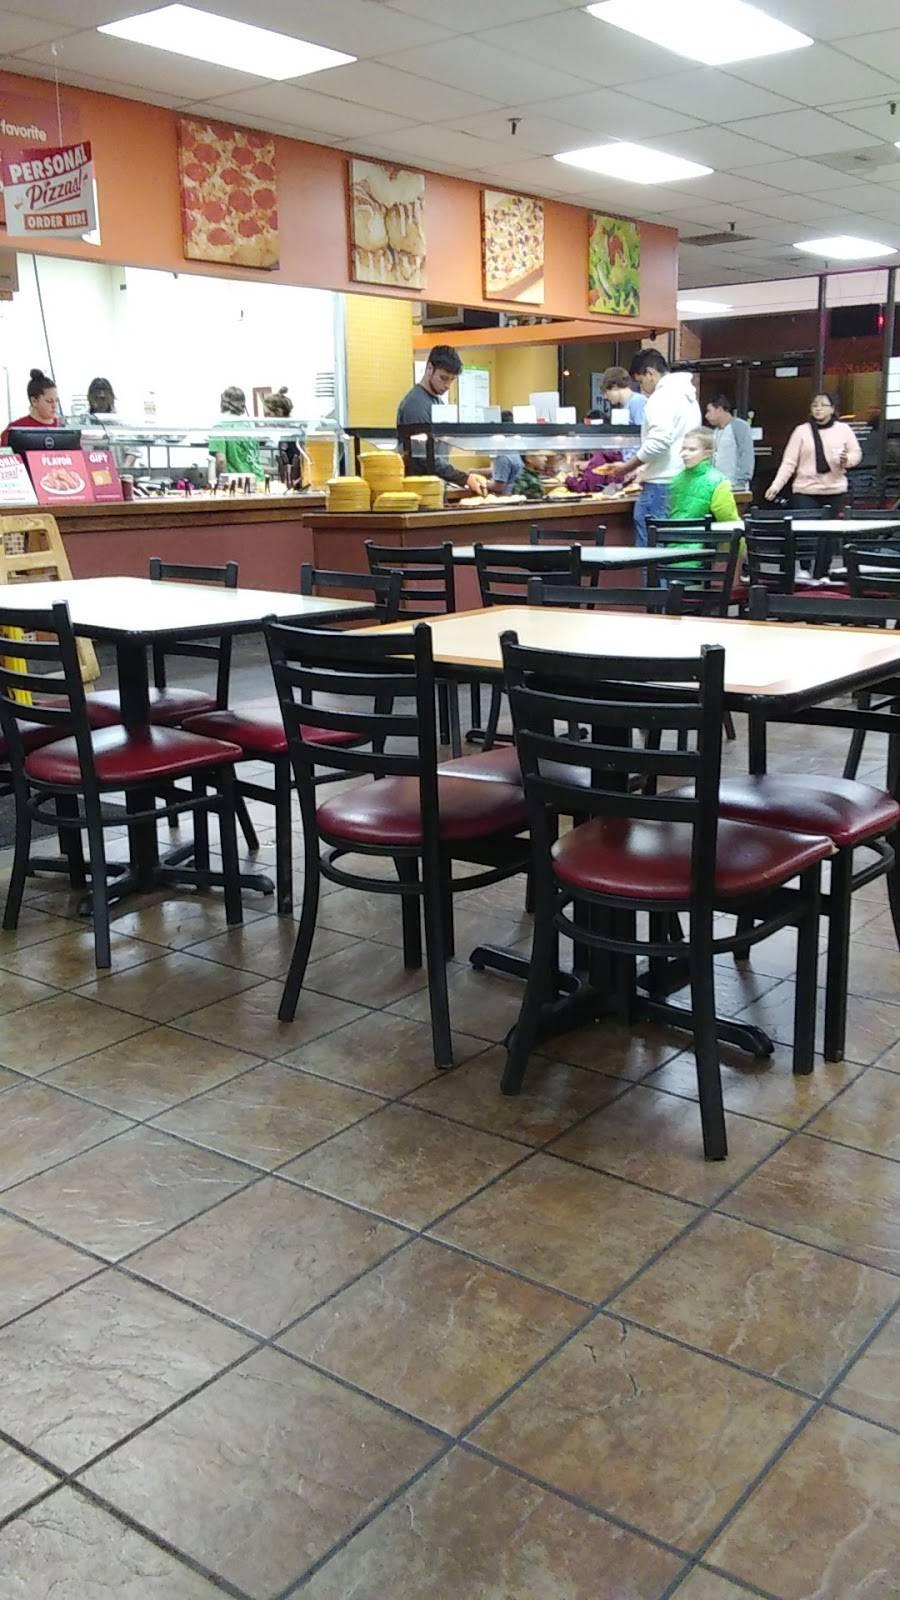 Cicis   restaurant   1807 Cherry Rd #163-165, Rock Hill, SC 29732, USA   8033243433 OR +1 803-324-3433